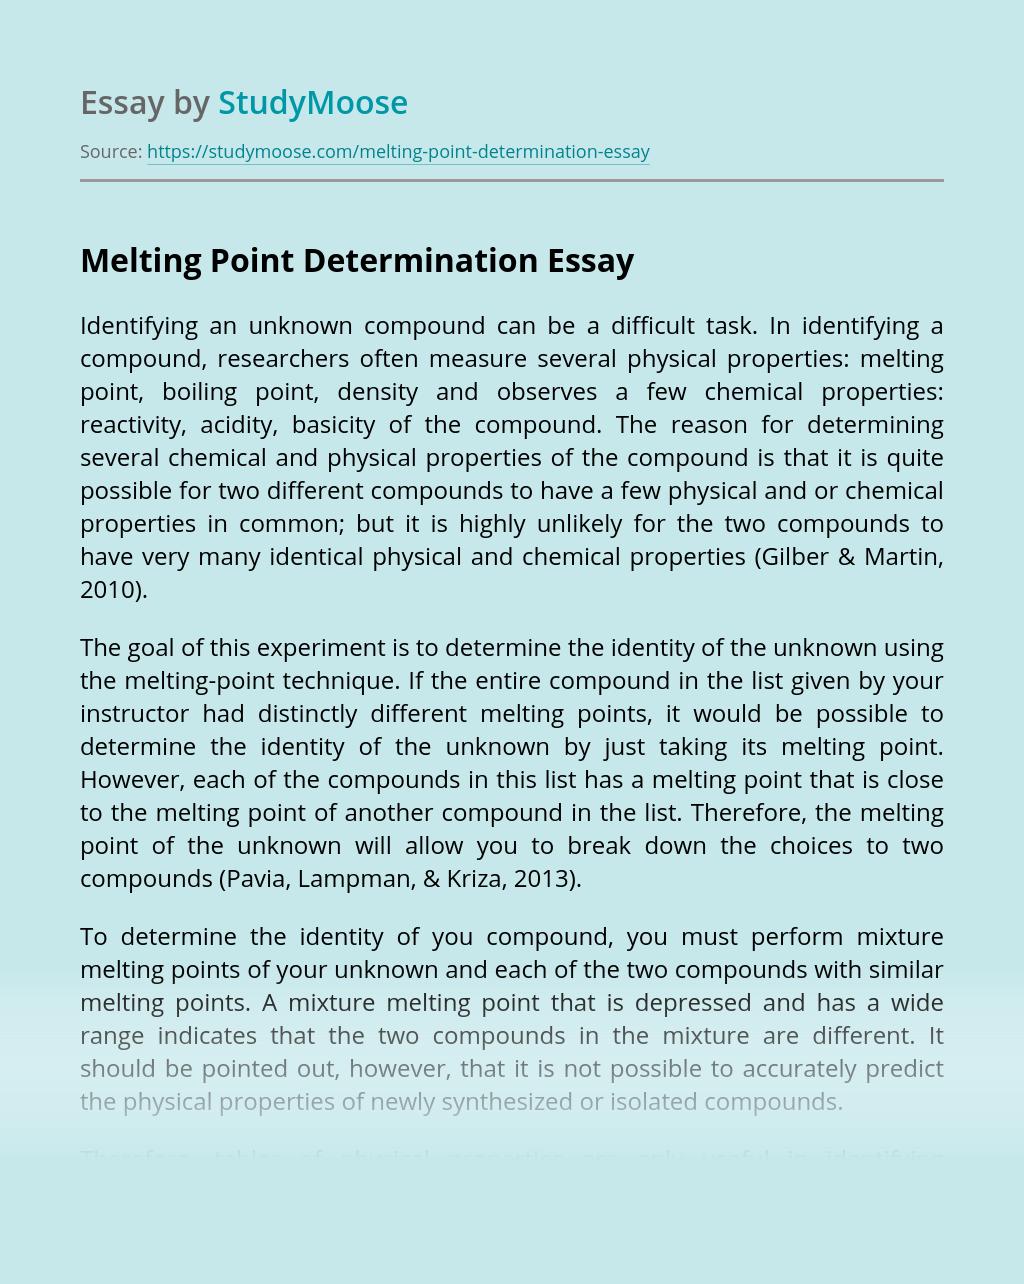 Melting Point Determination